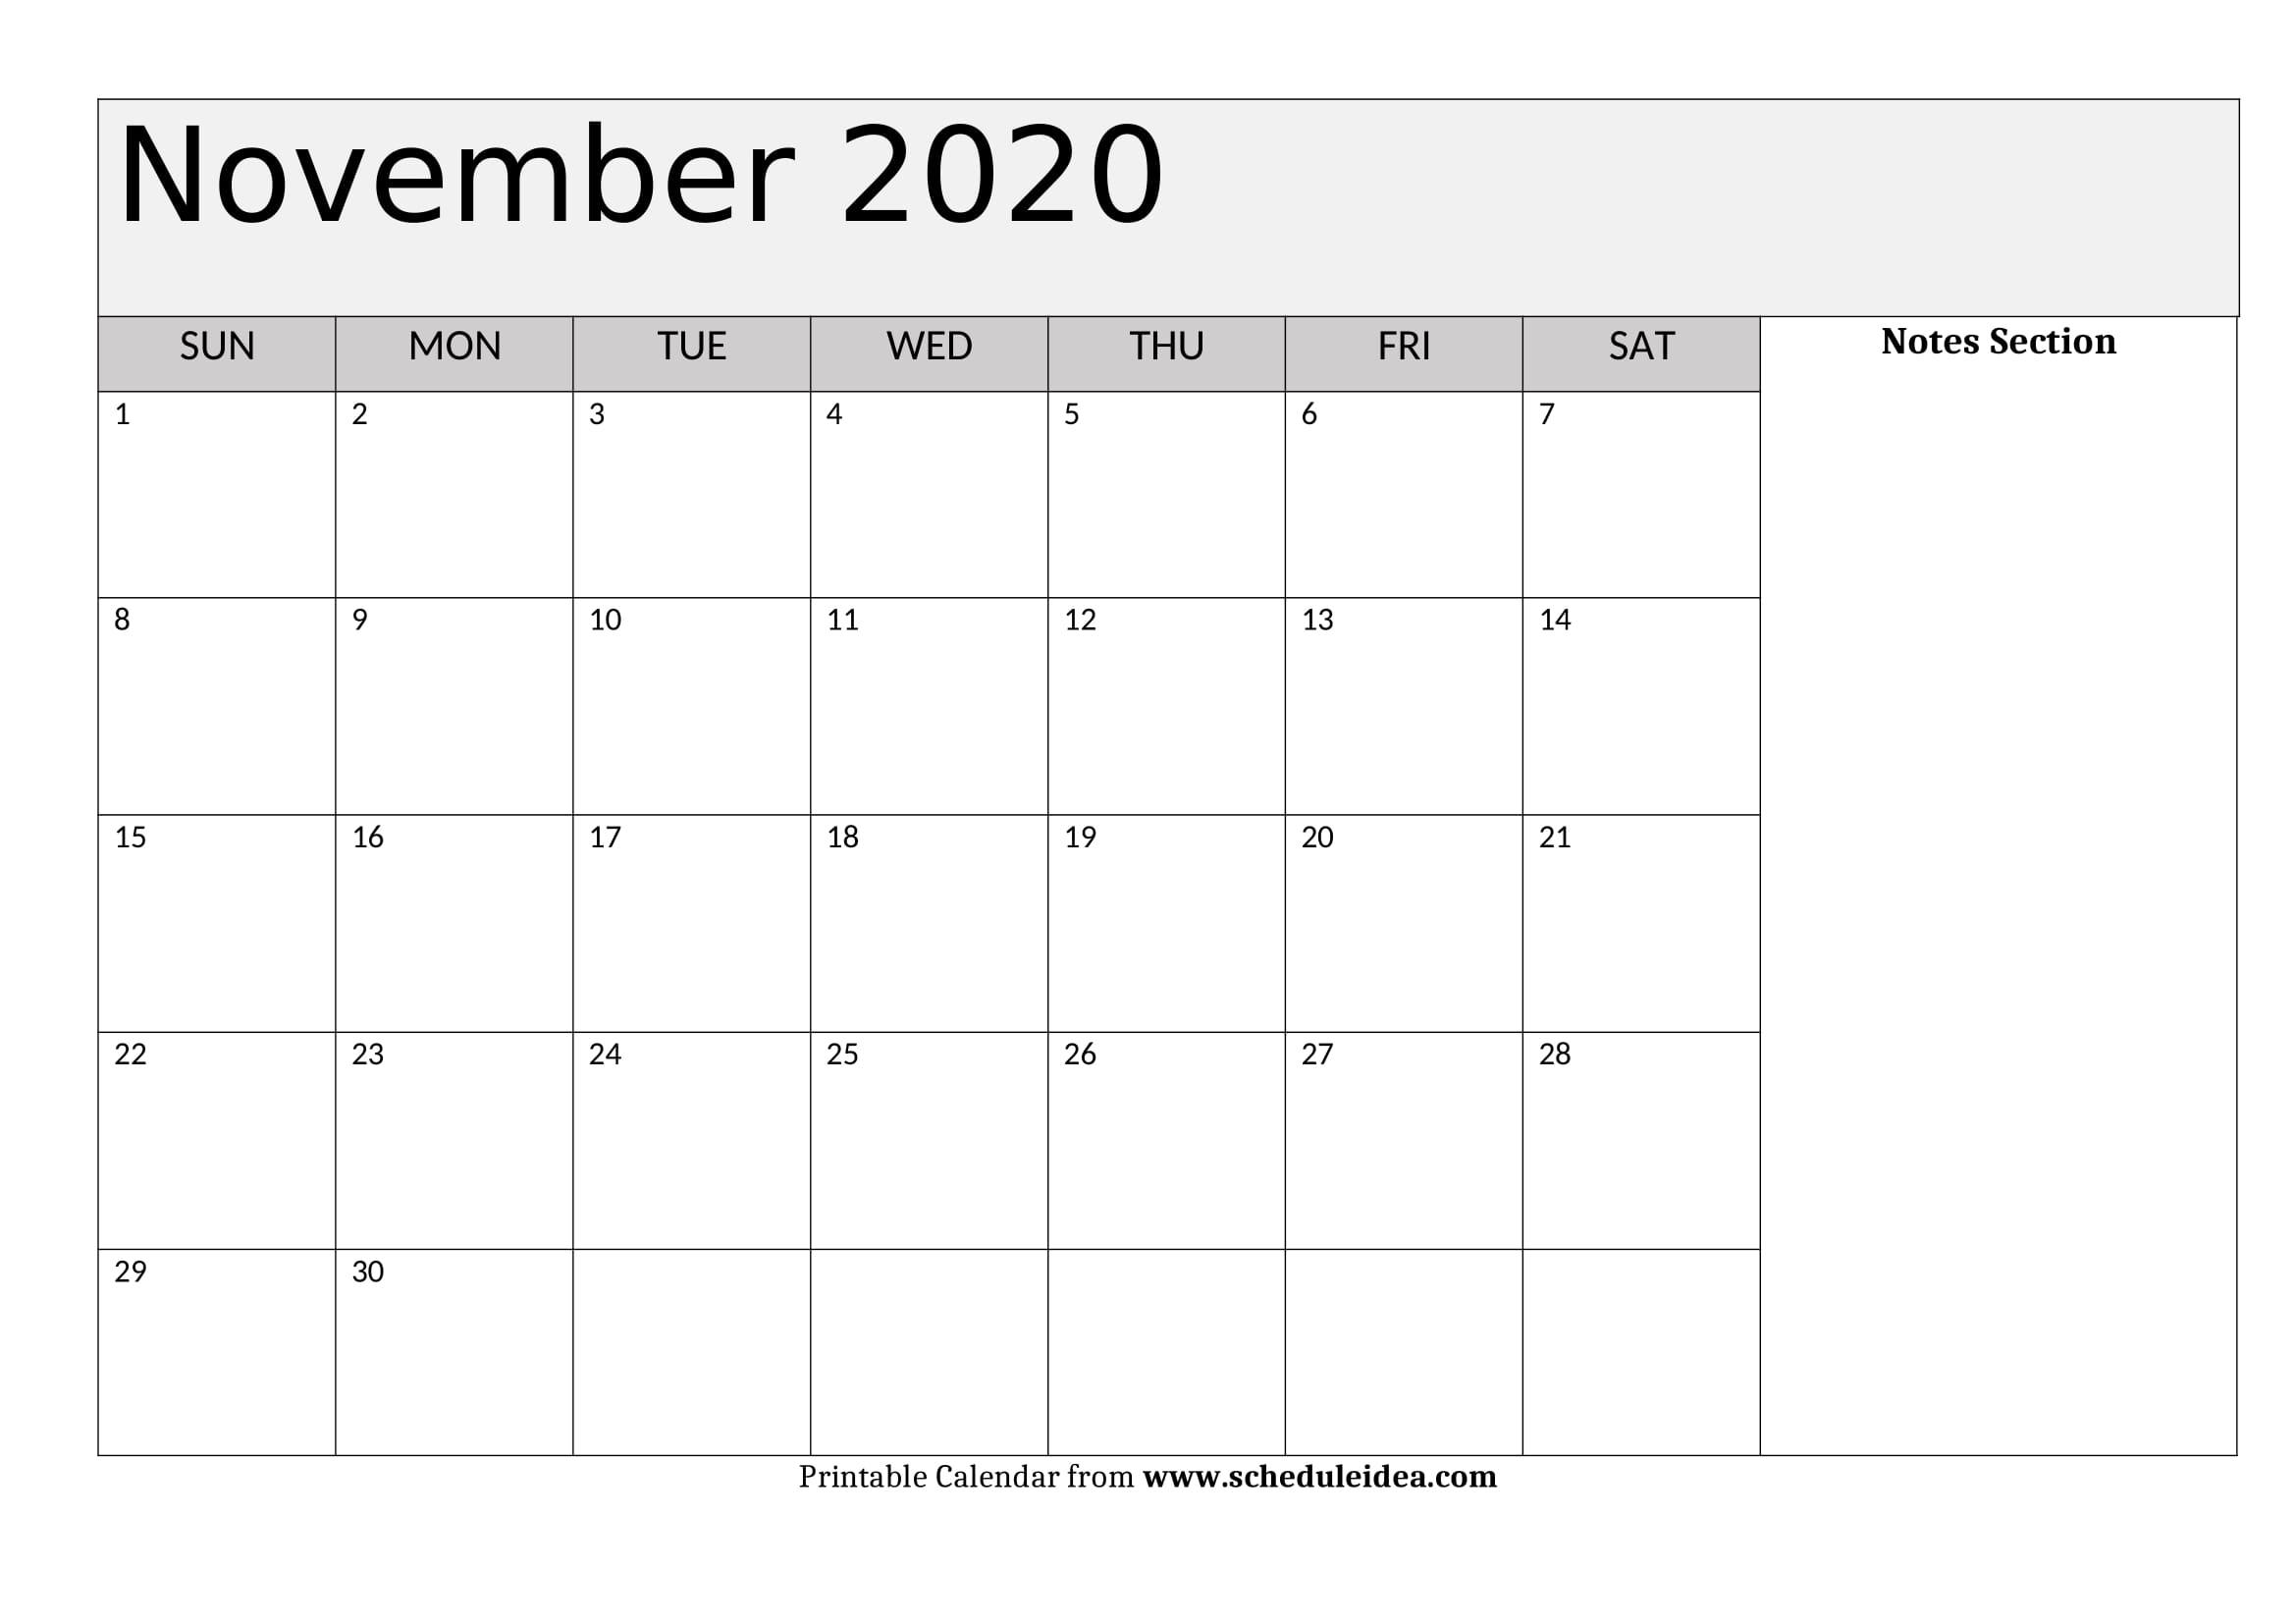 November 2020 Printable Calendar - Editable Templates (Pdf, Word)